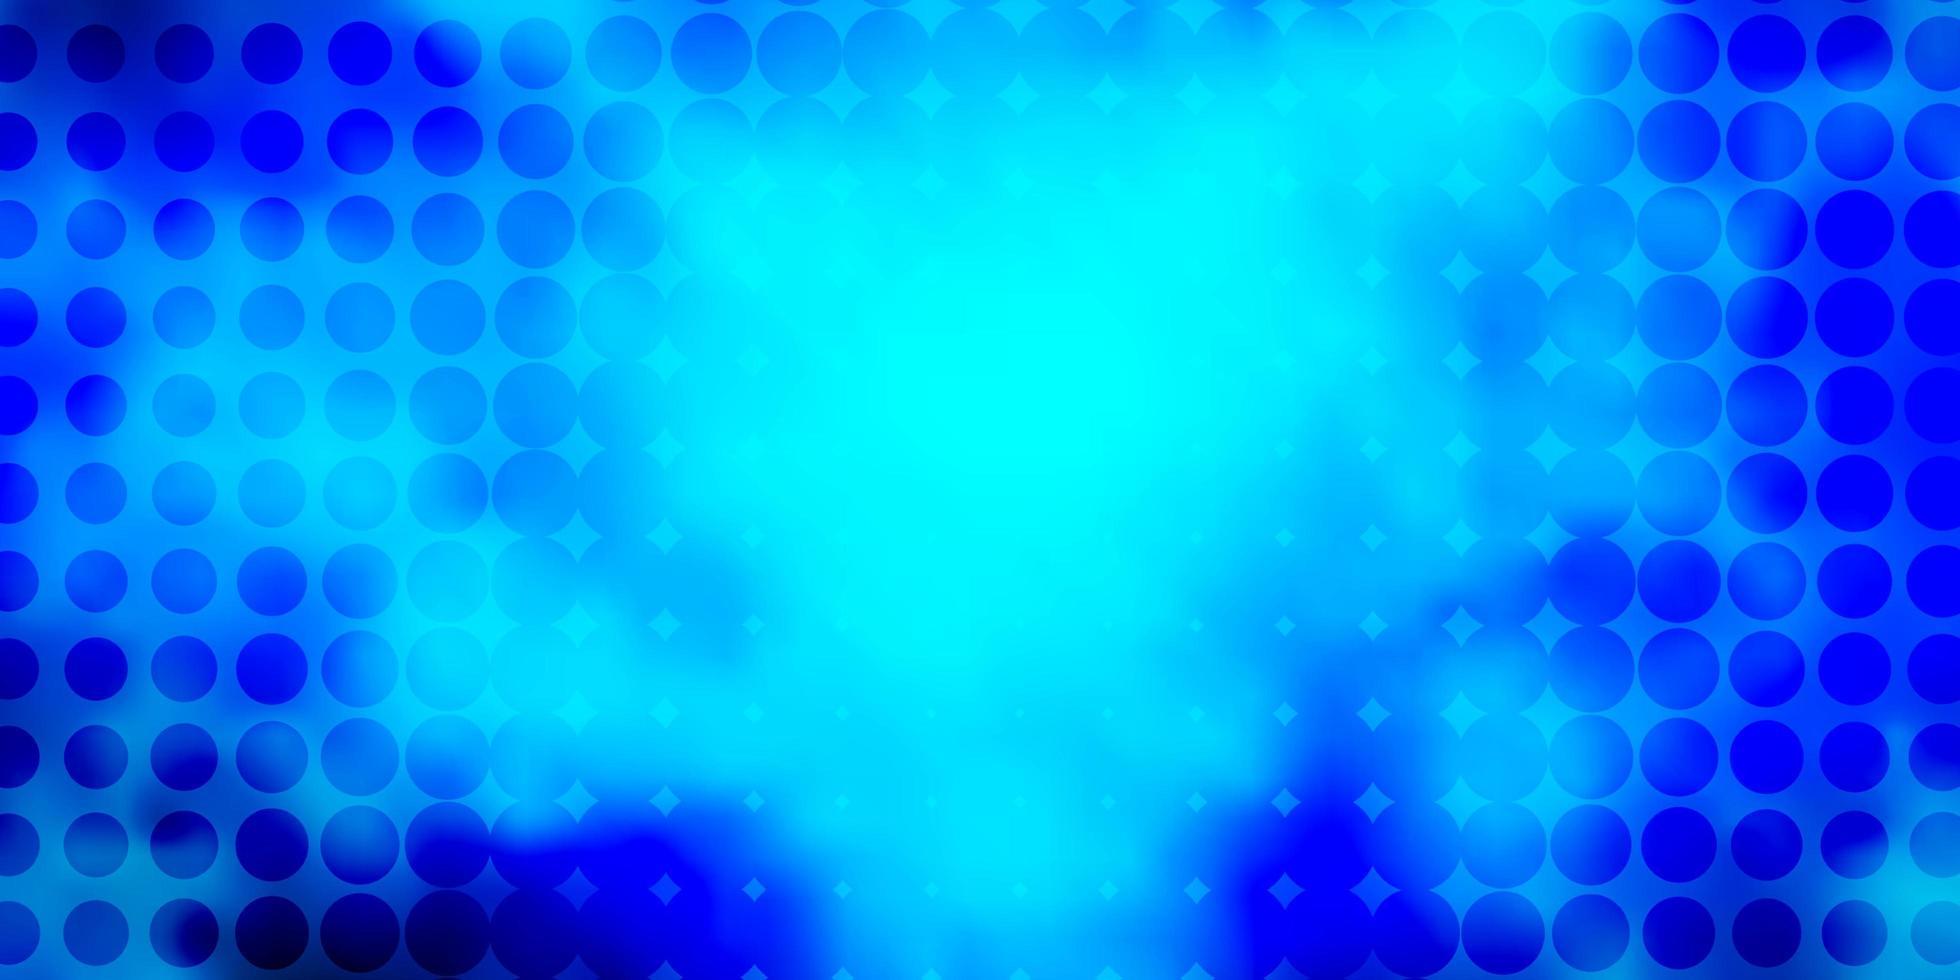 Dark BLUE vector texture with disks.